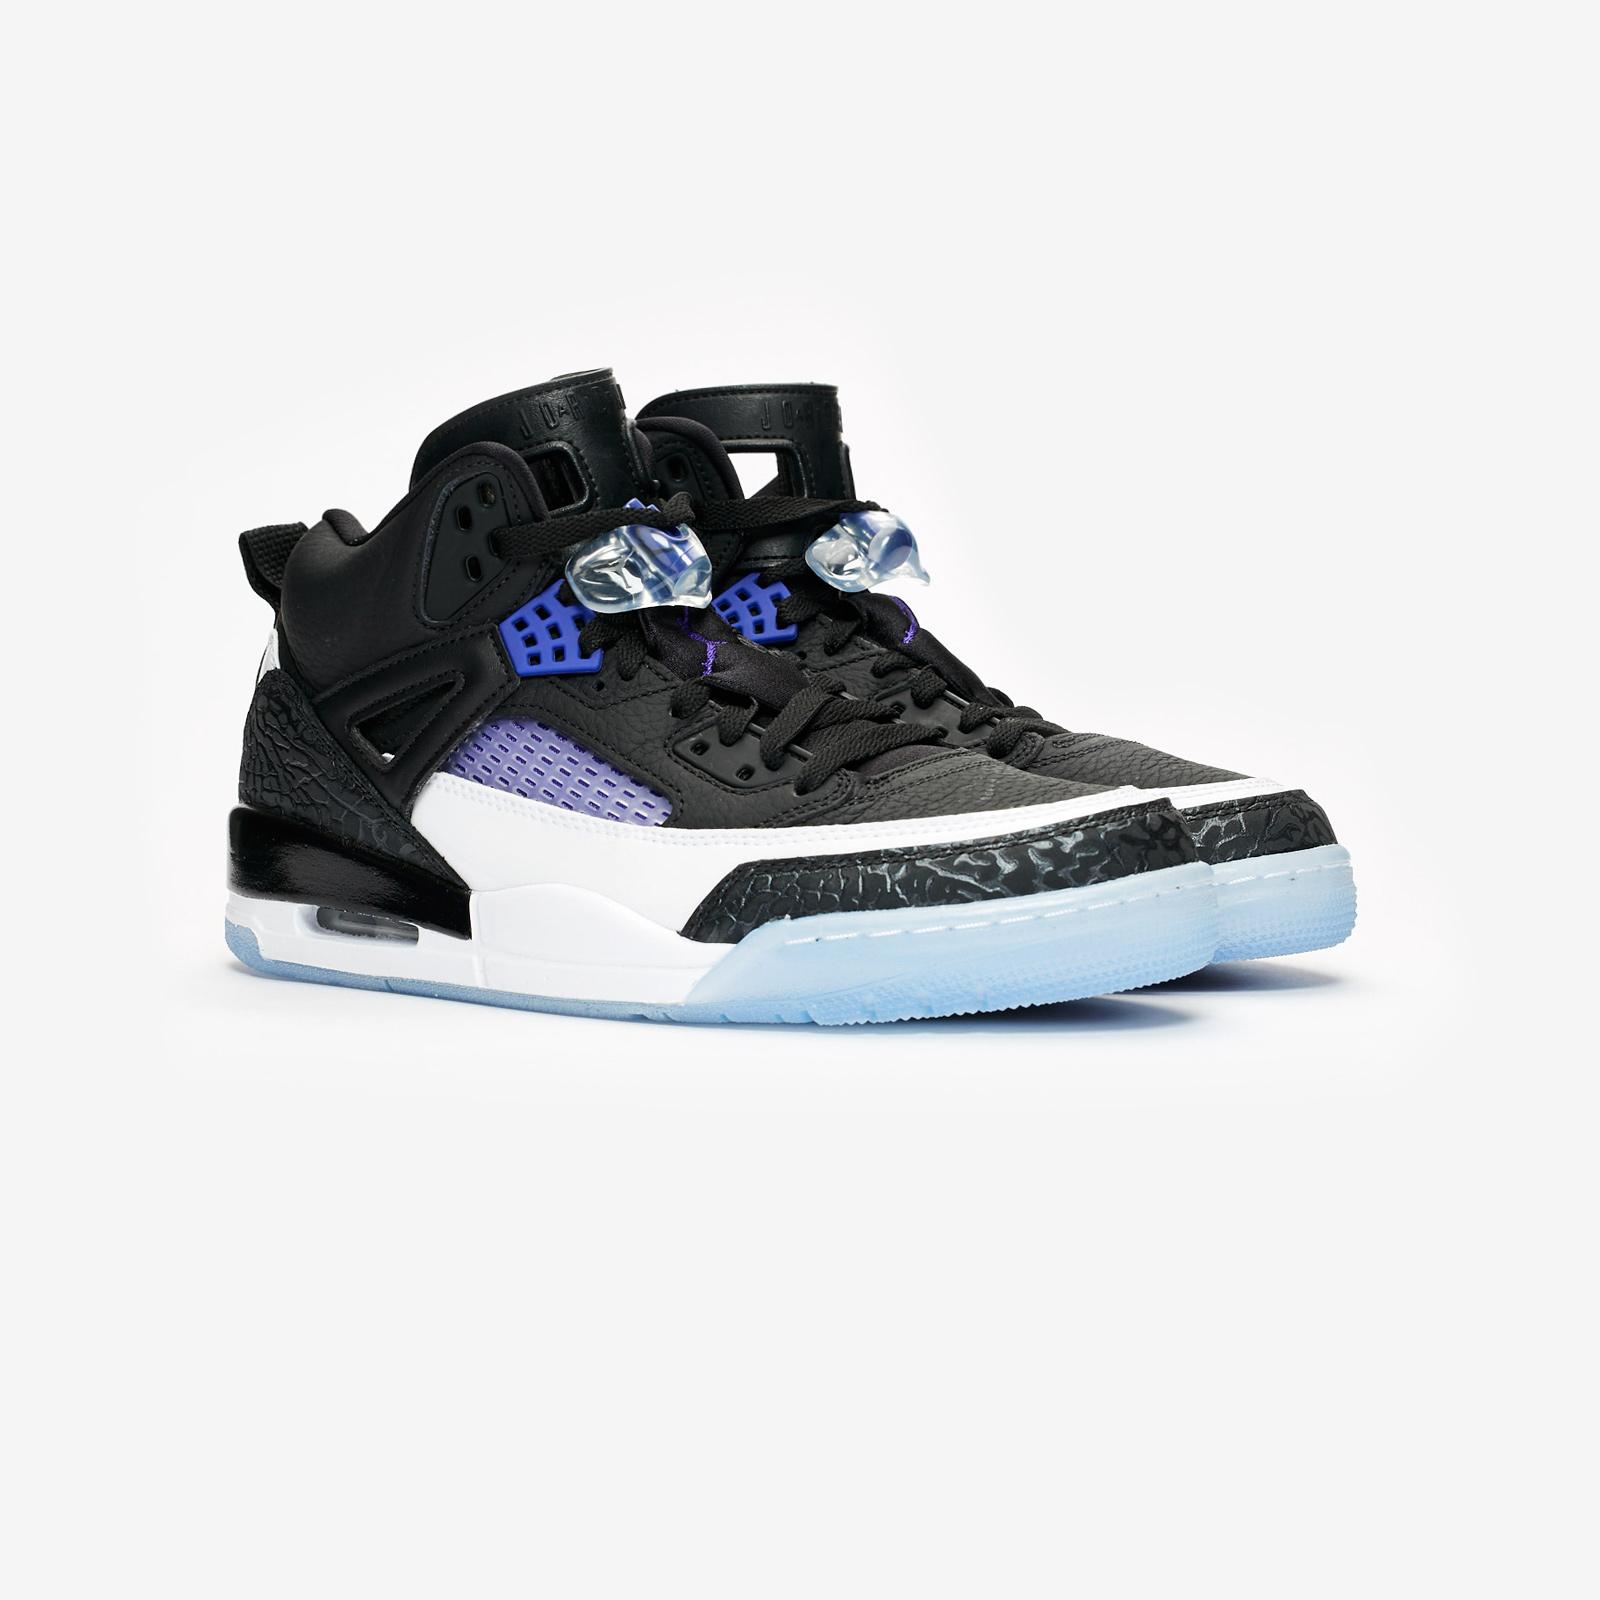 Jordan Brand Jordan Spizike - 315371-005 - Sneakersnstuff  8de7327f3